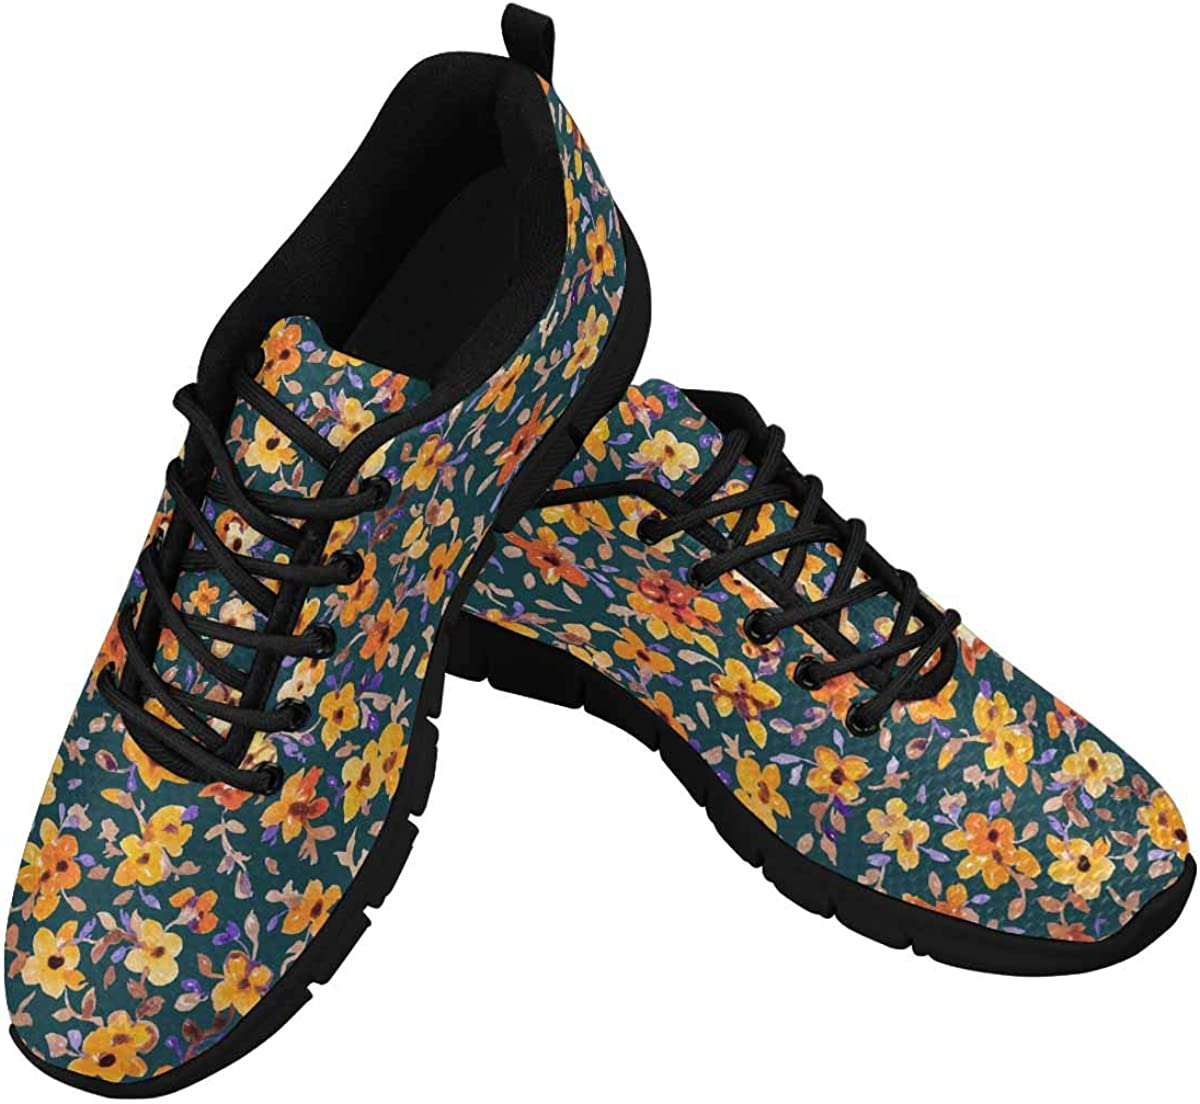 InterestPrint Colorful Flower Floral Women's Athletic Walking Shoes Comfort Mesh Non Slip